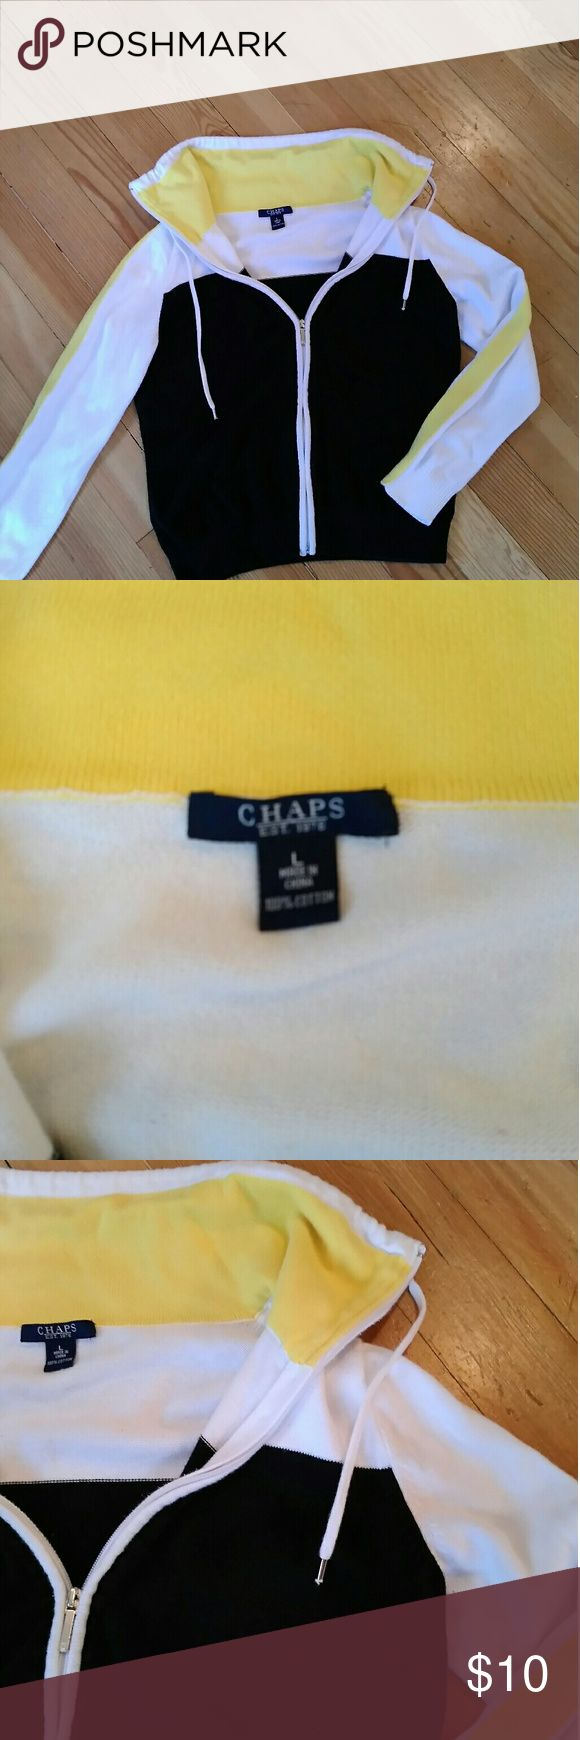 CHAPS BY RAlPH  LAUREN ZIP UP SWEATER NAUTICAL ZIP SWEATER Chaps Sweaters